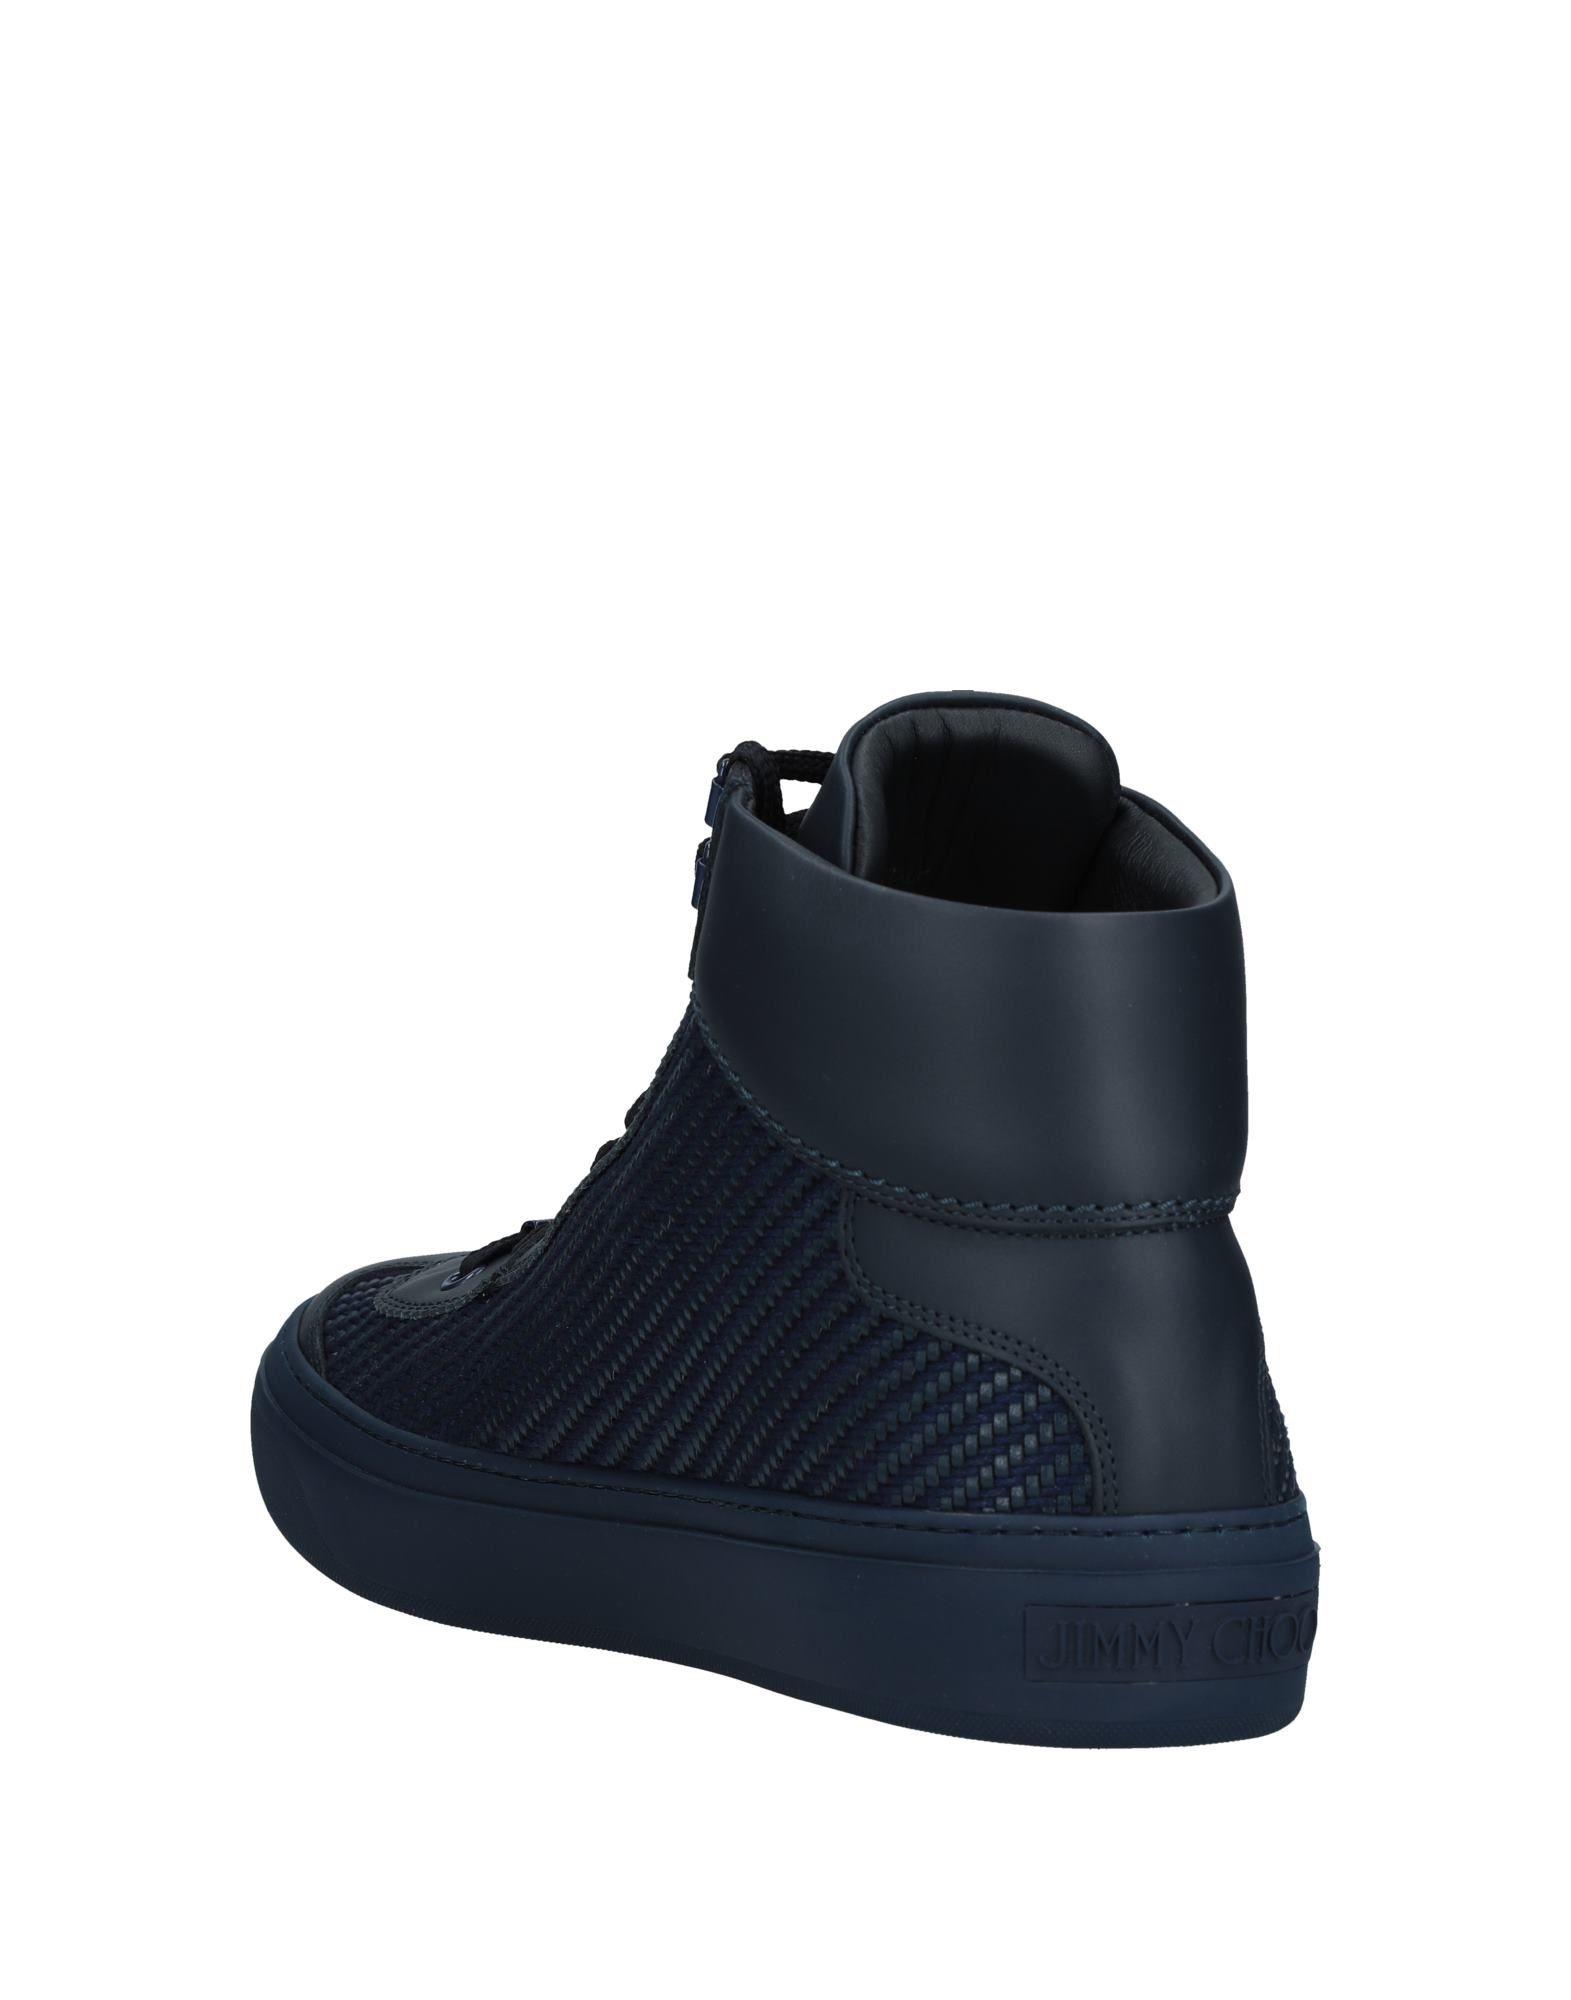 Jimmy Choo Sneakers Herren    11530541IF Neue Schuhe b4d4d4